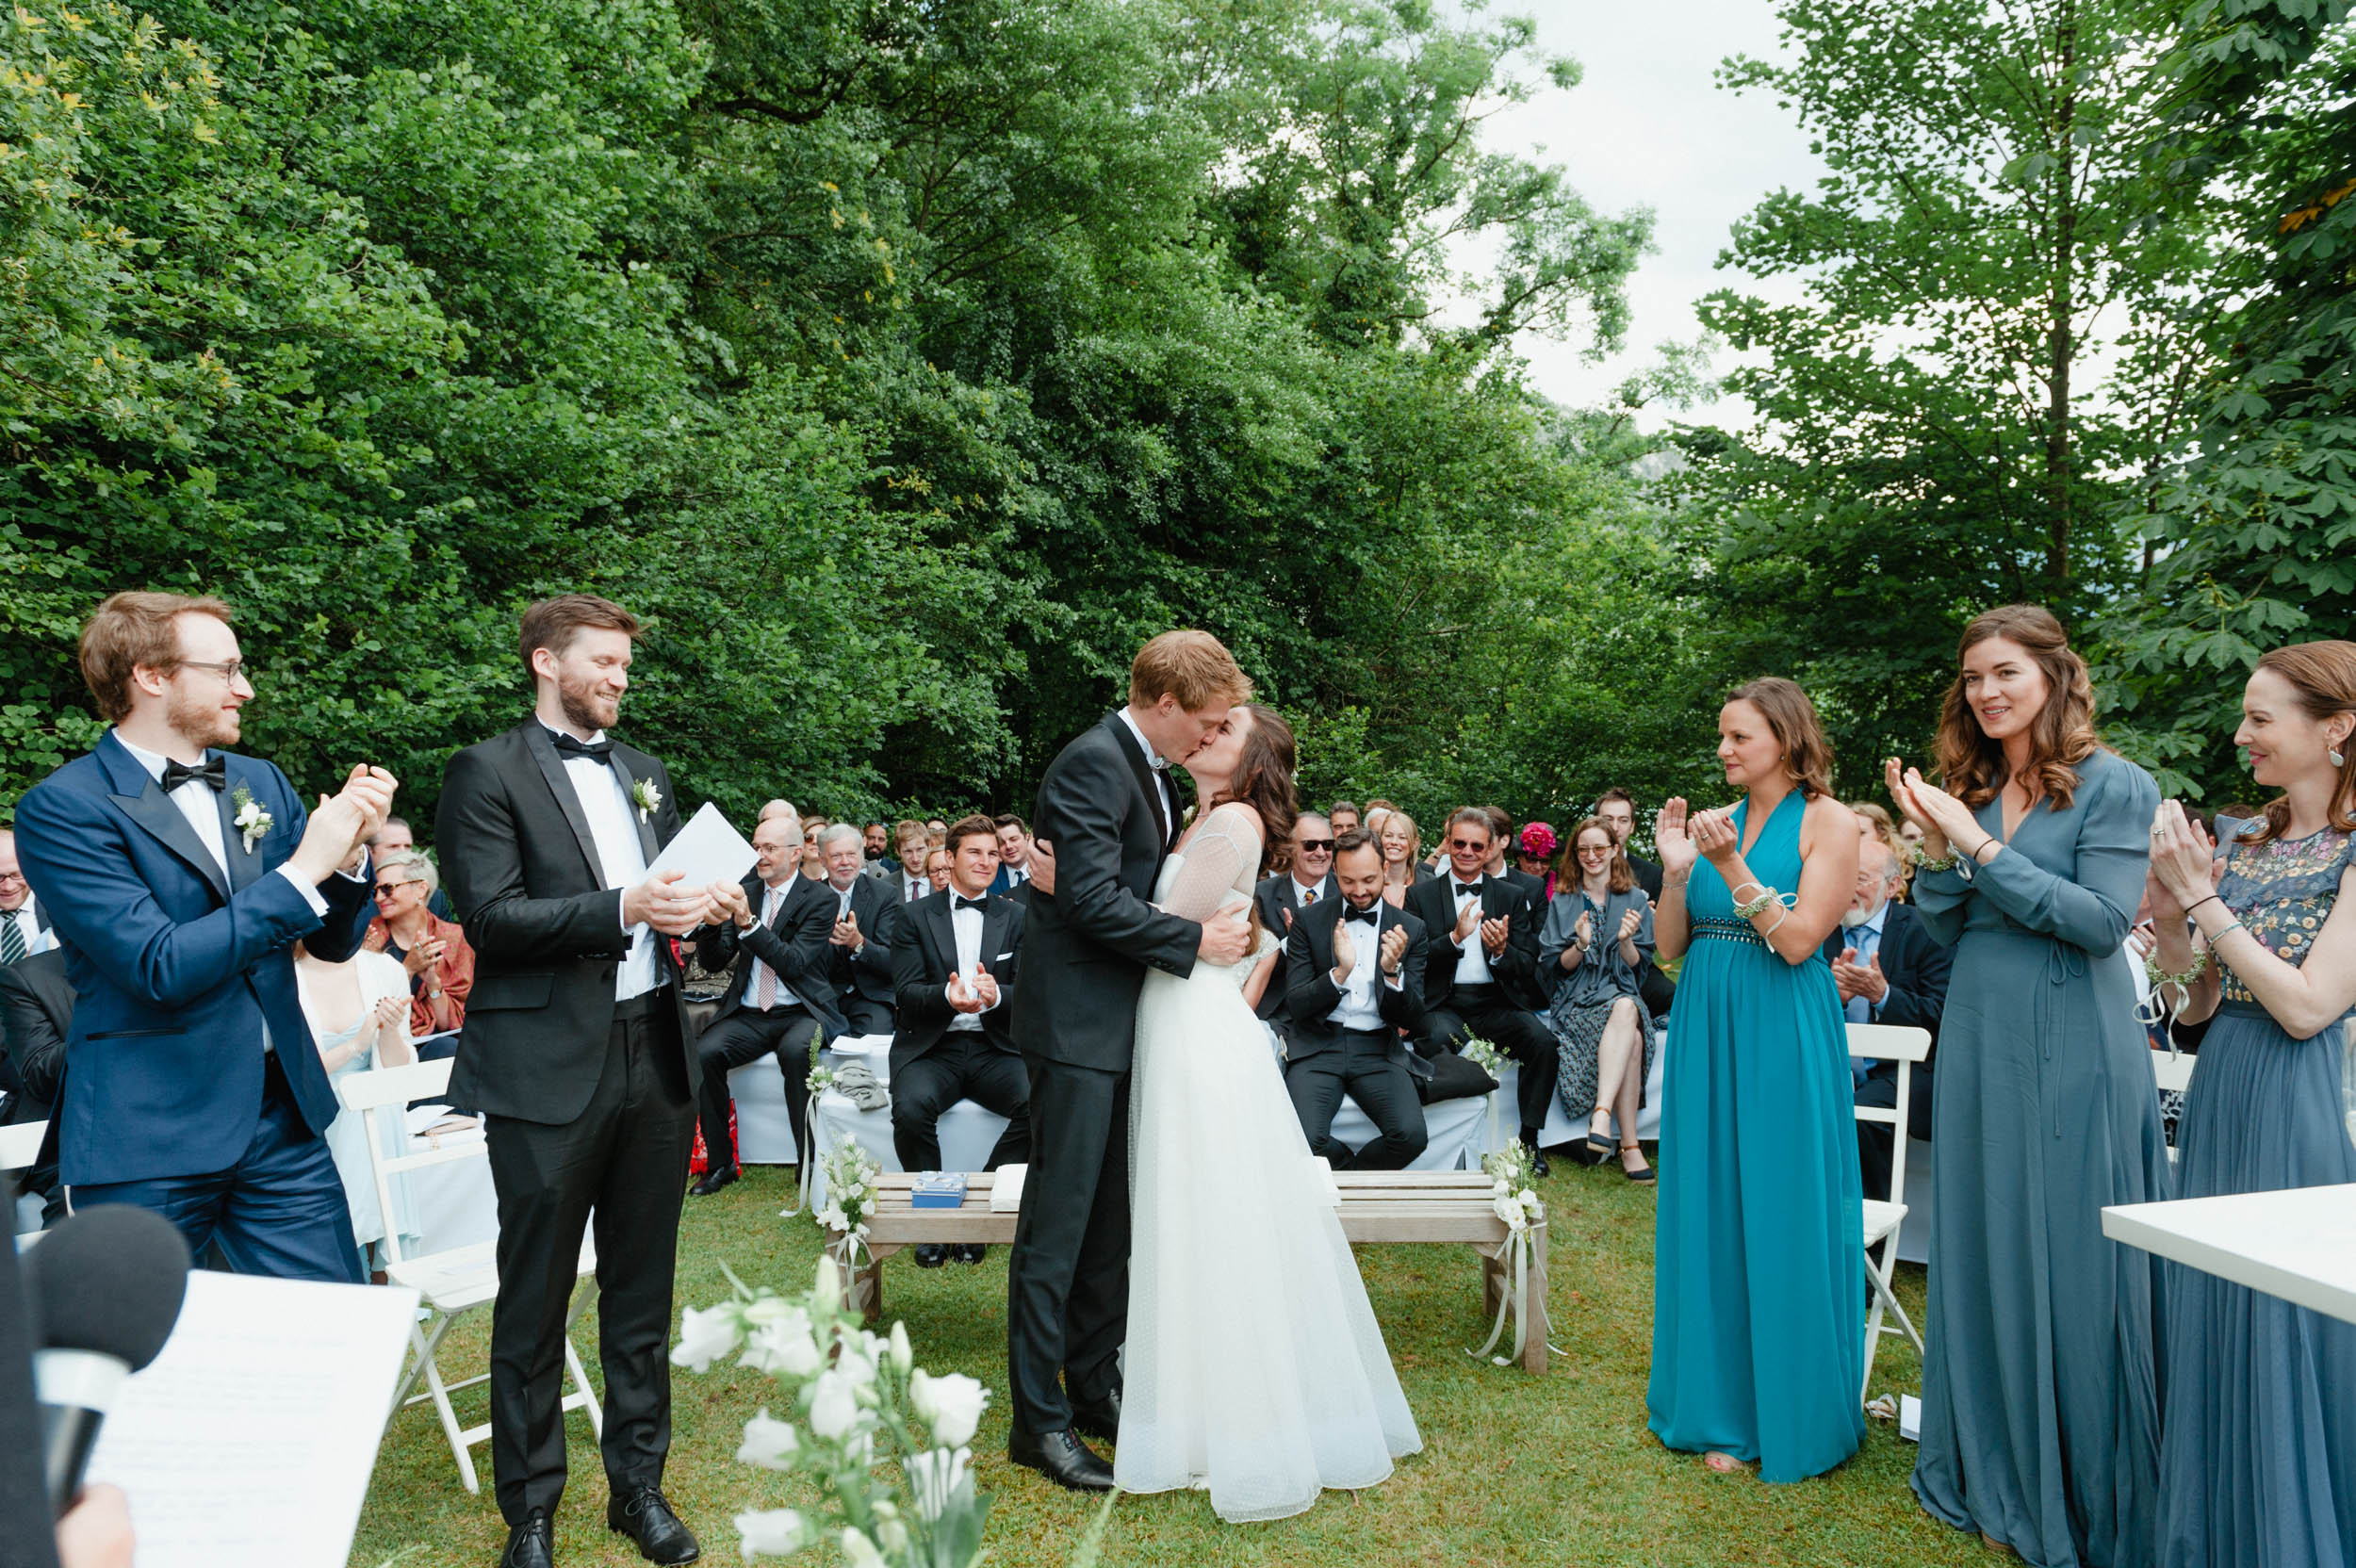 Attersee_Wedding-31.jpg